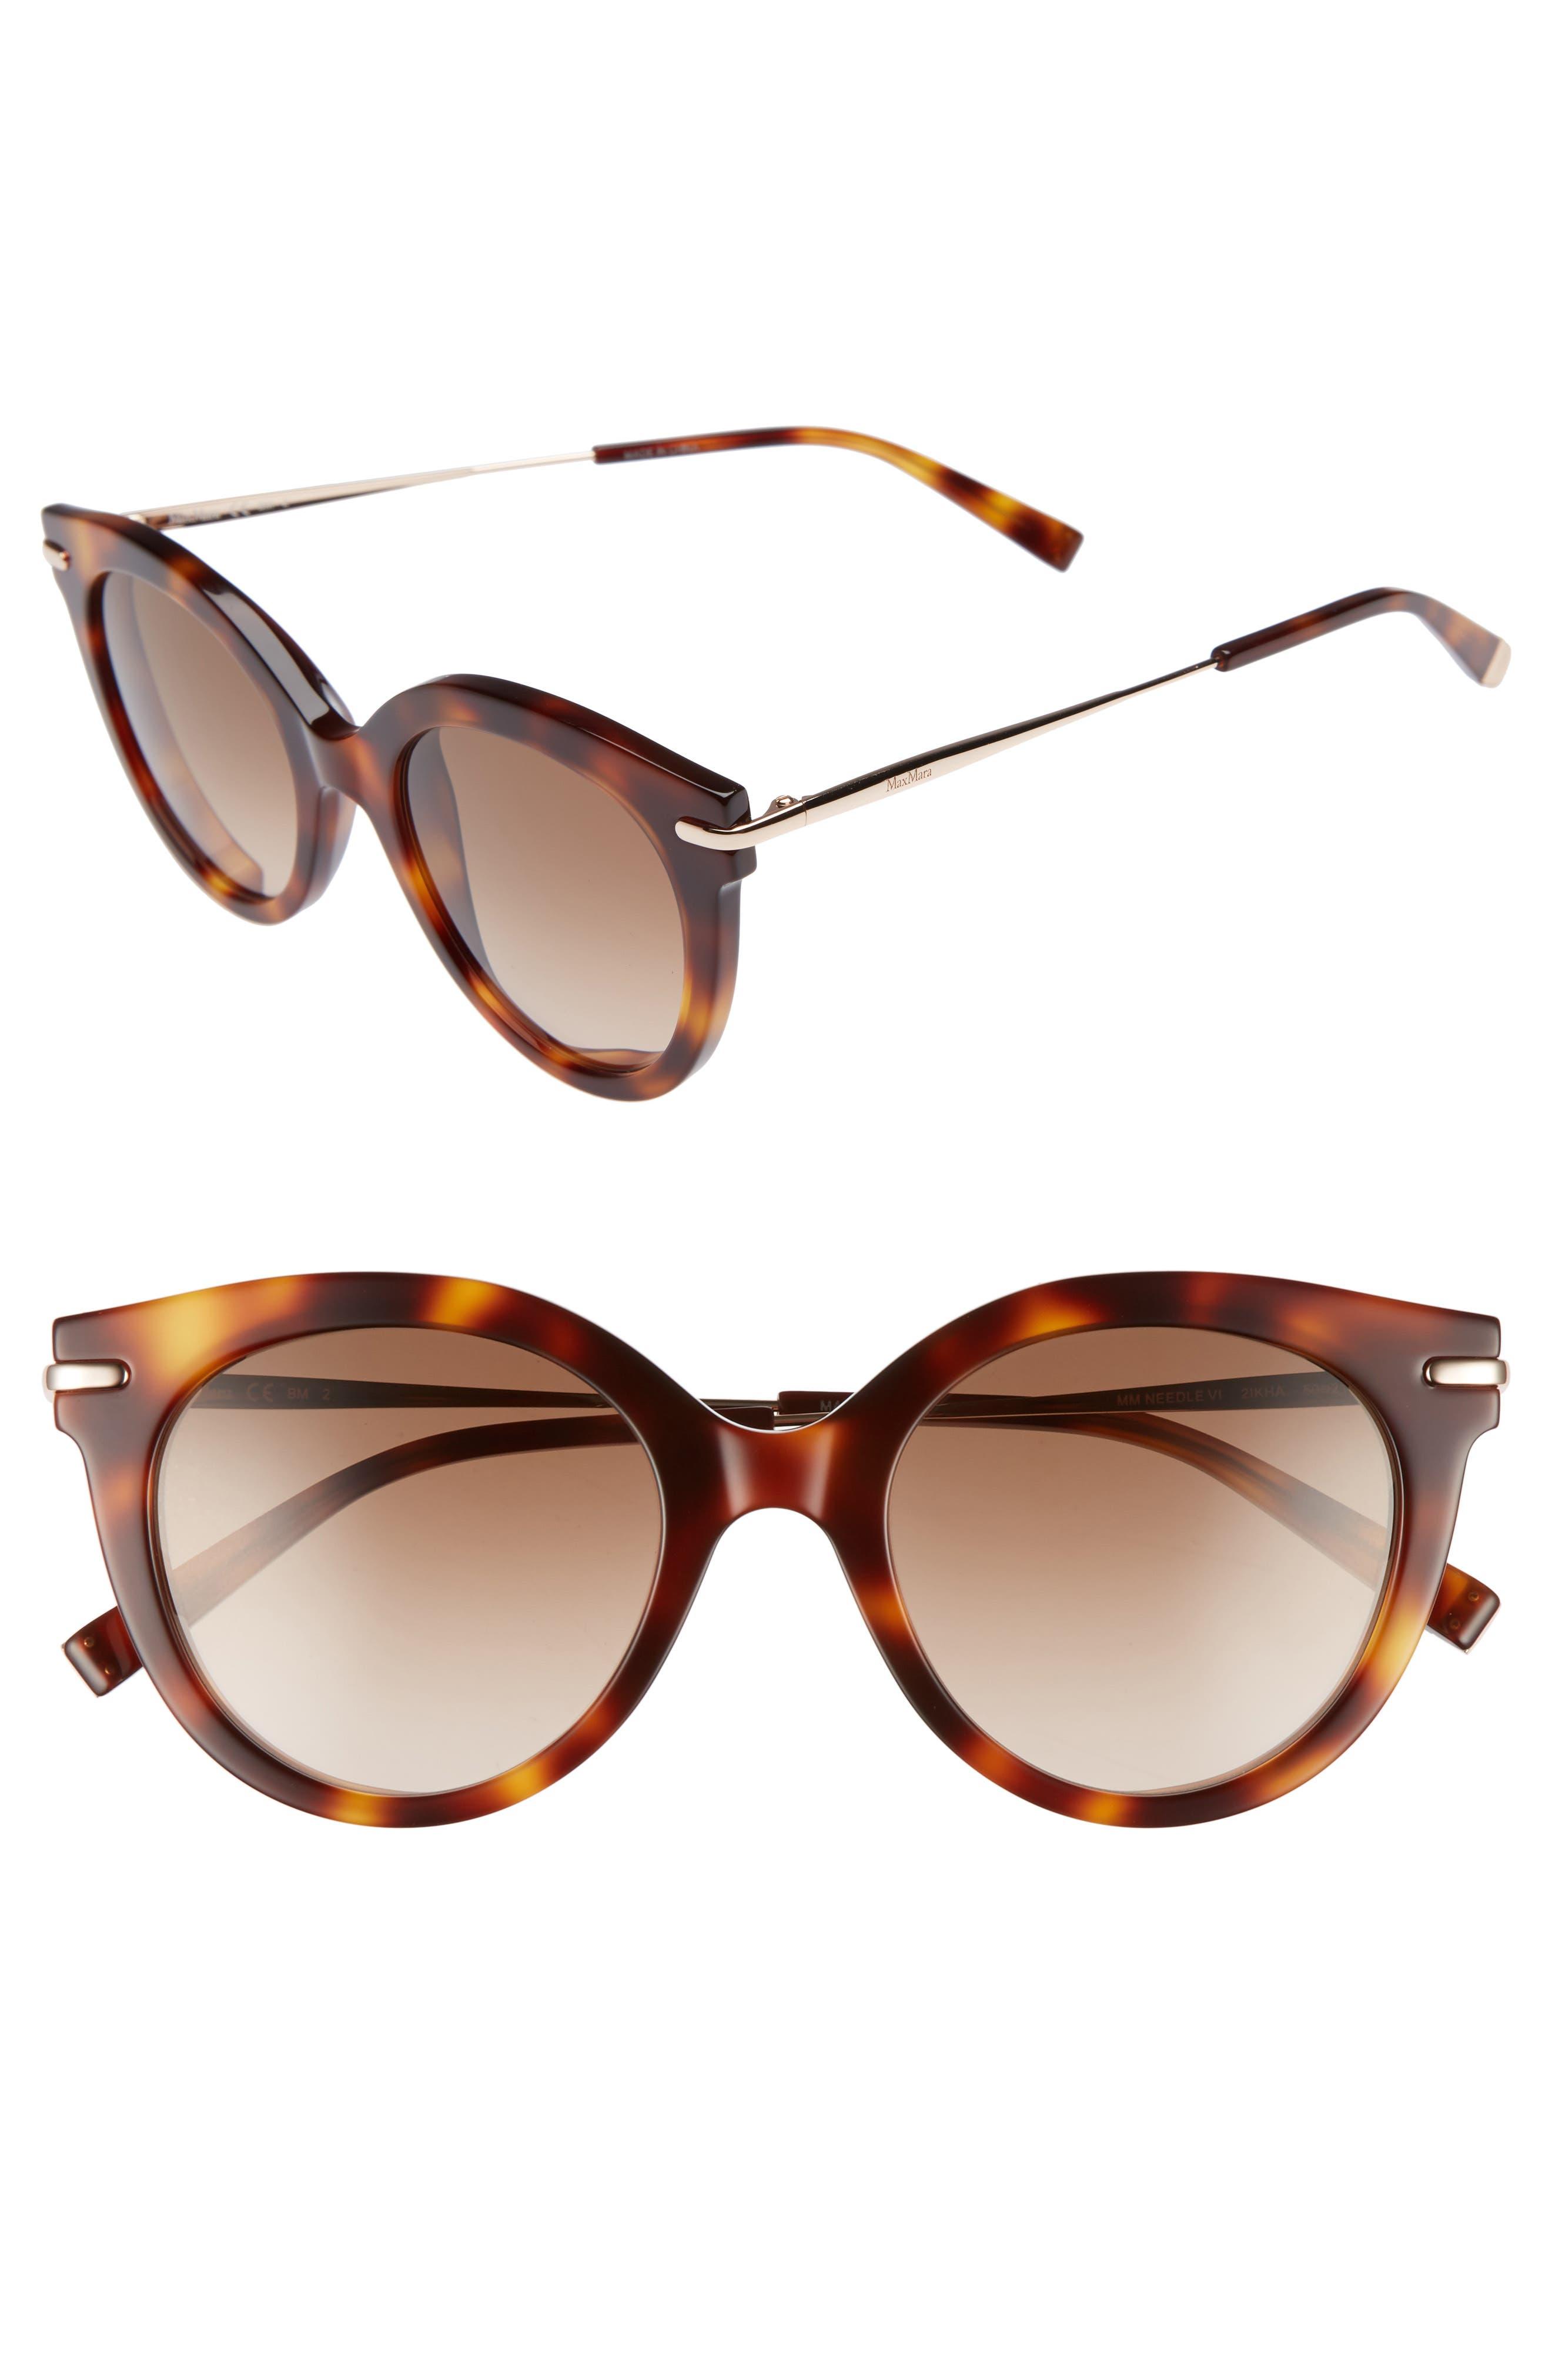 Main Image - Max Mara Needle VI 50mm Gradient Round Sunglasses